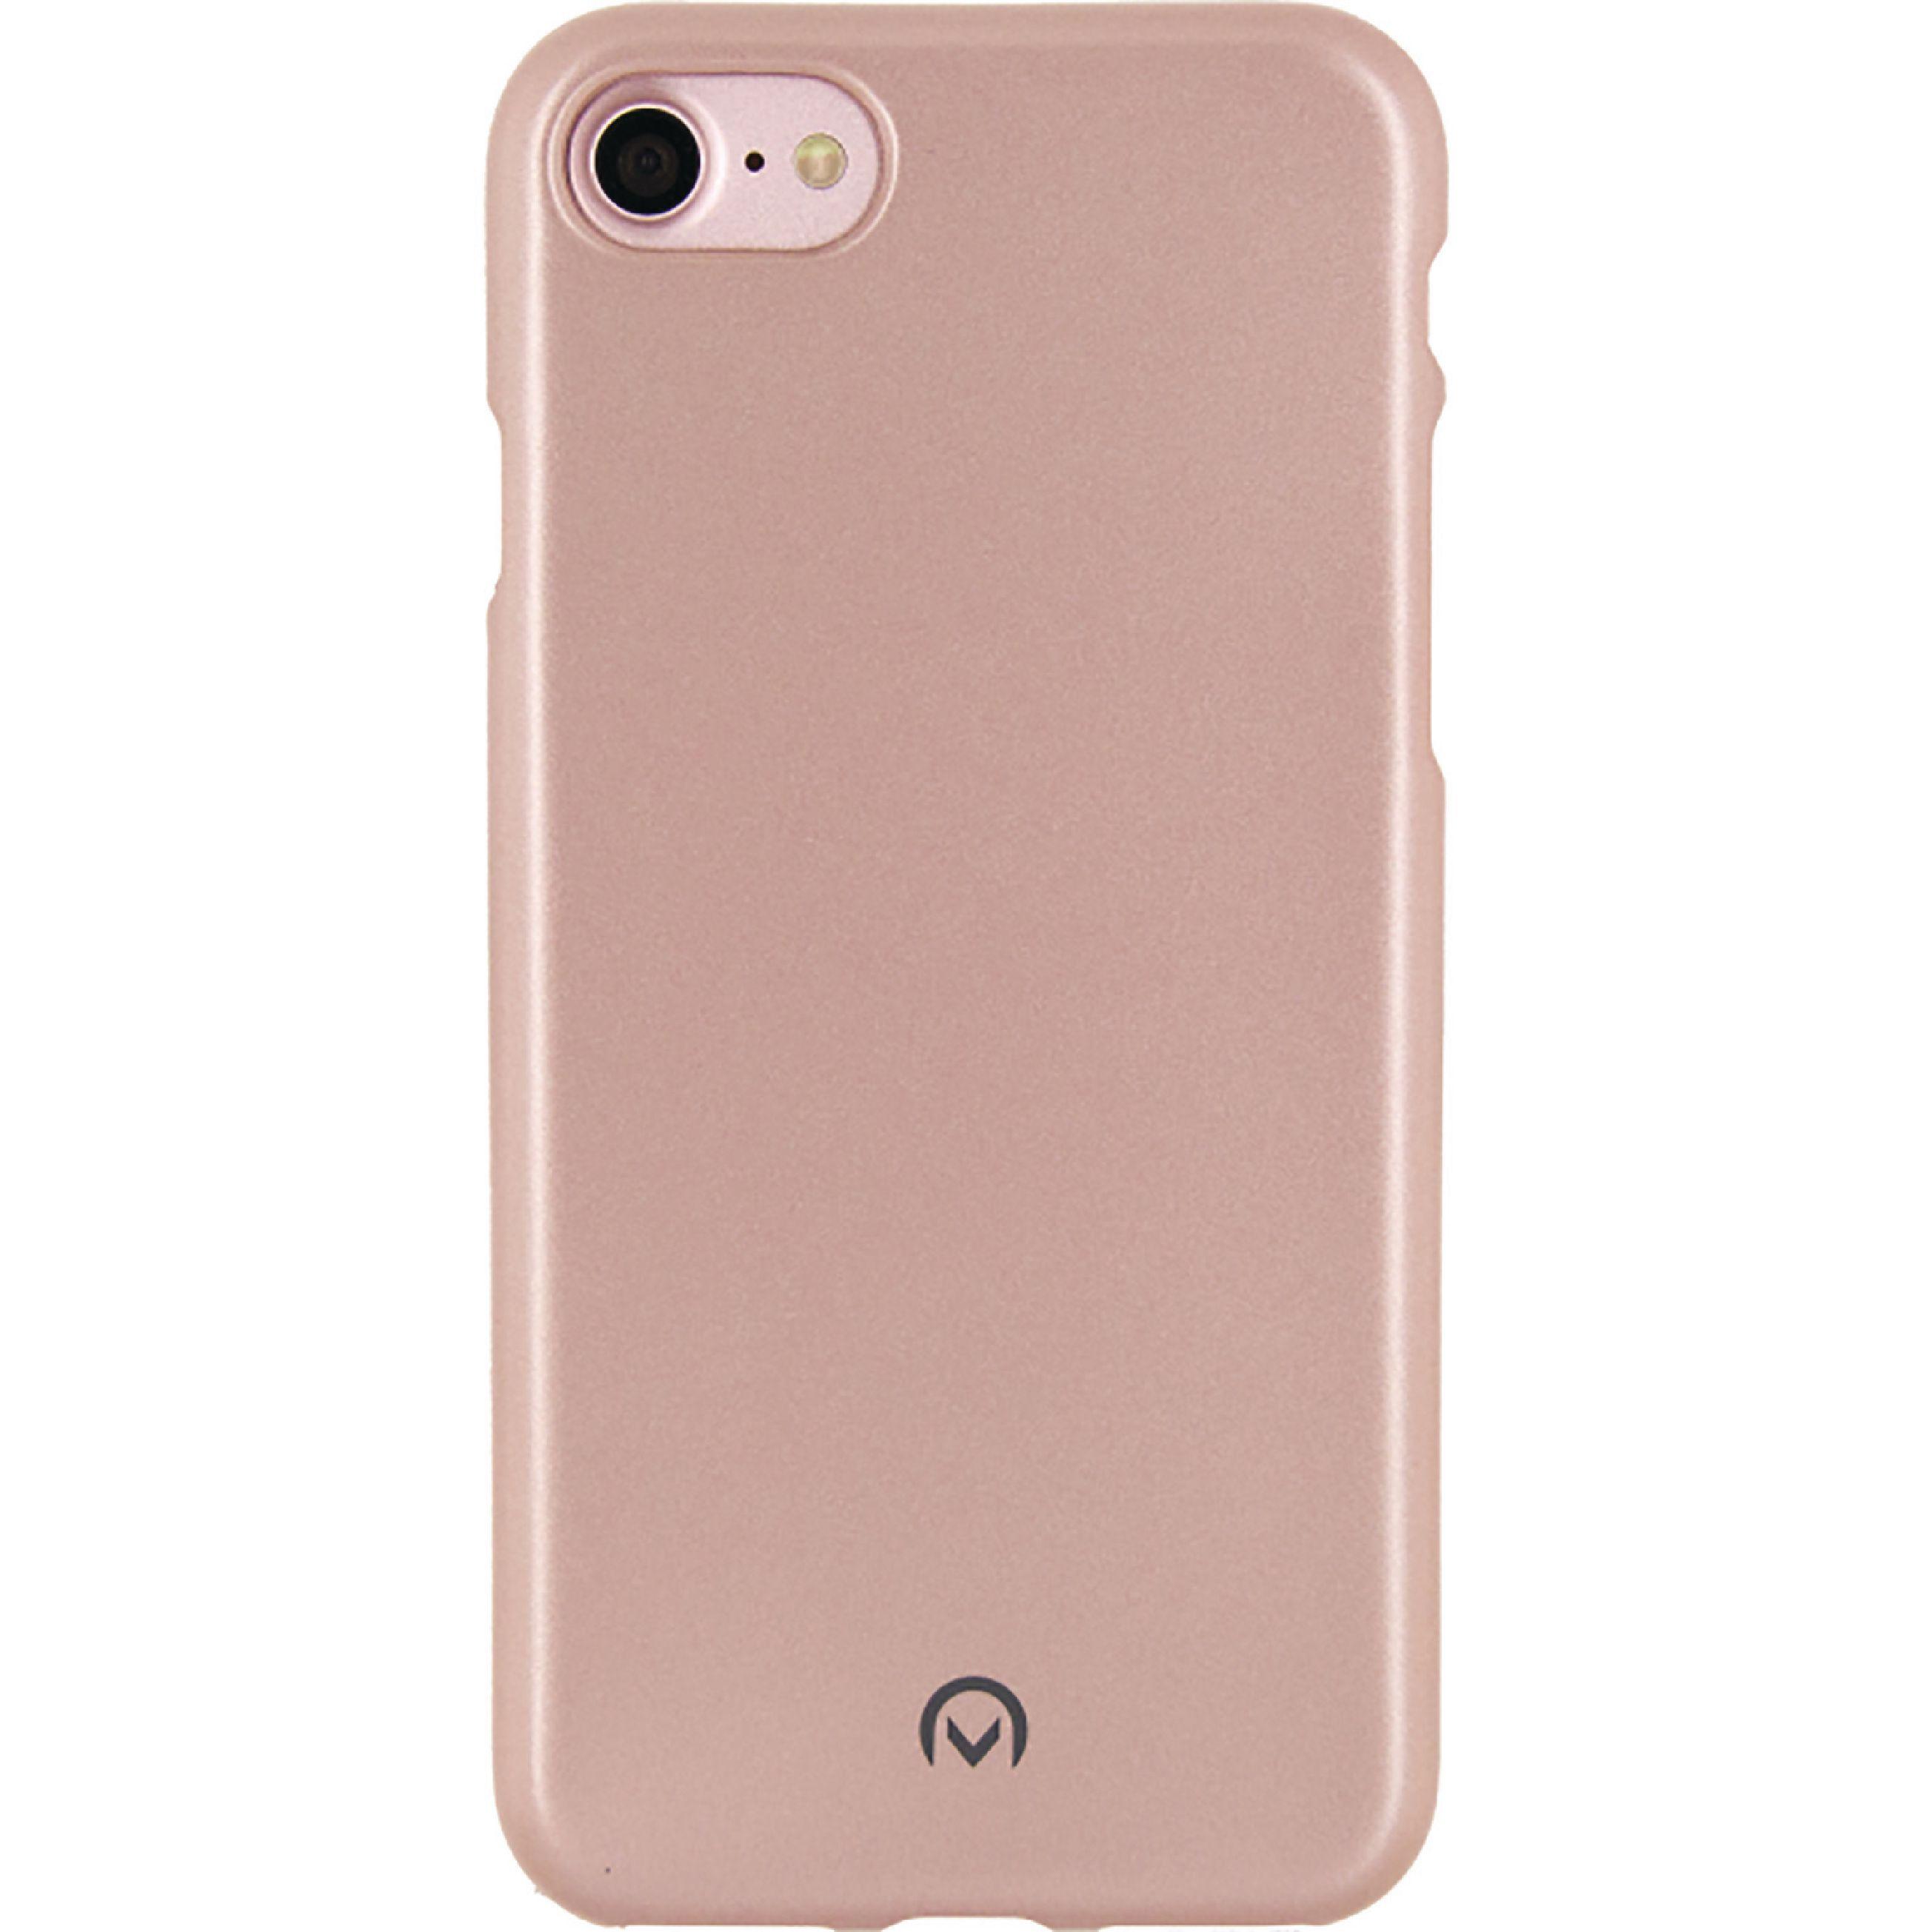 Image of   Telefon Metallisk Blødt Etui Apple iPhone 6 / 6s Pink